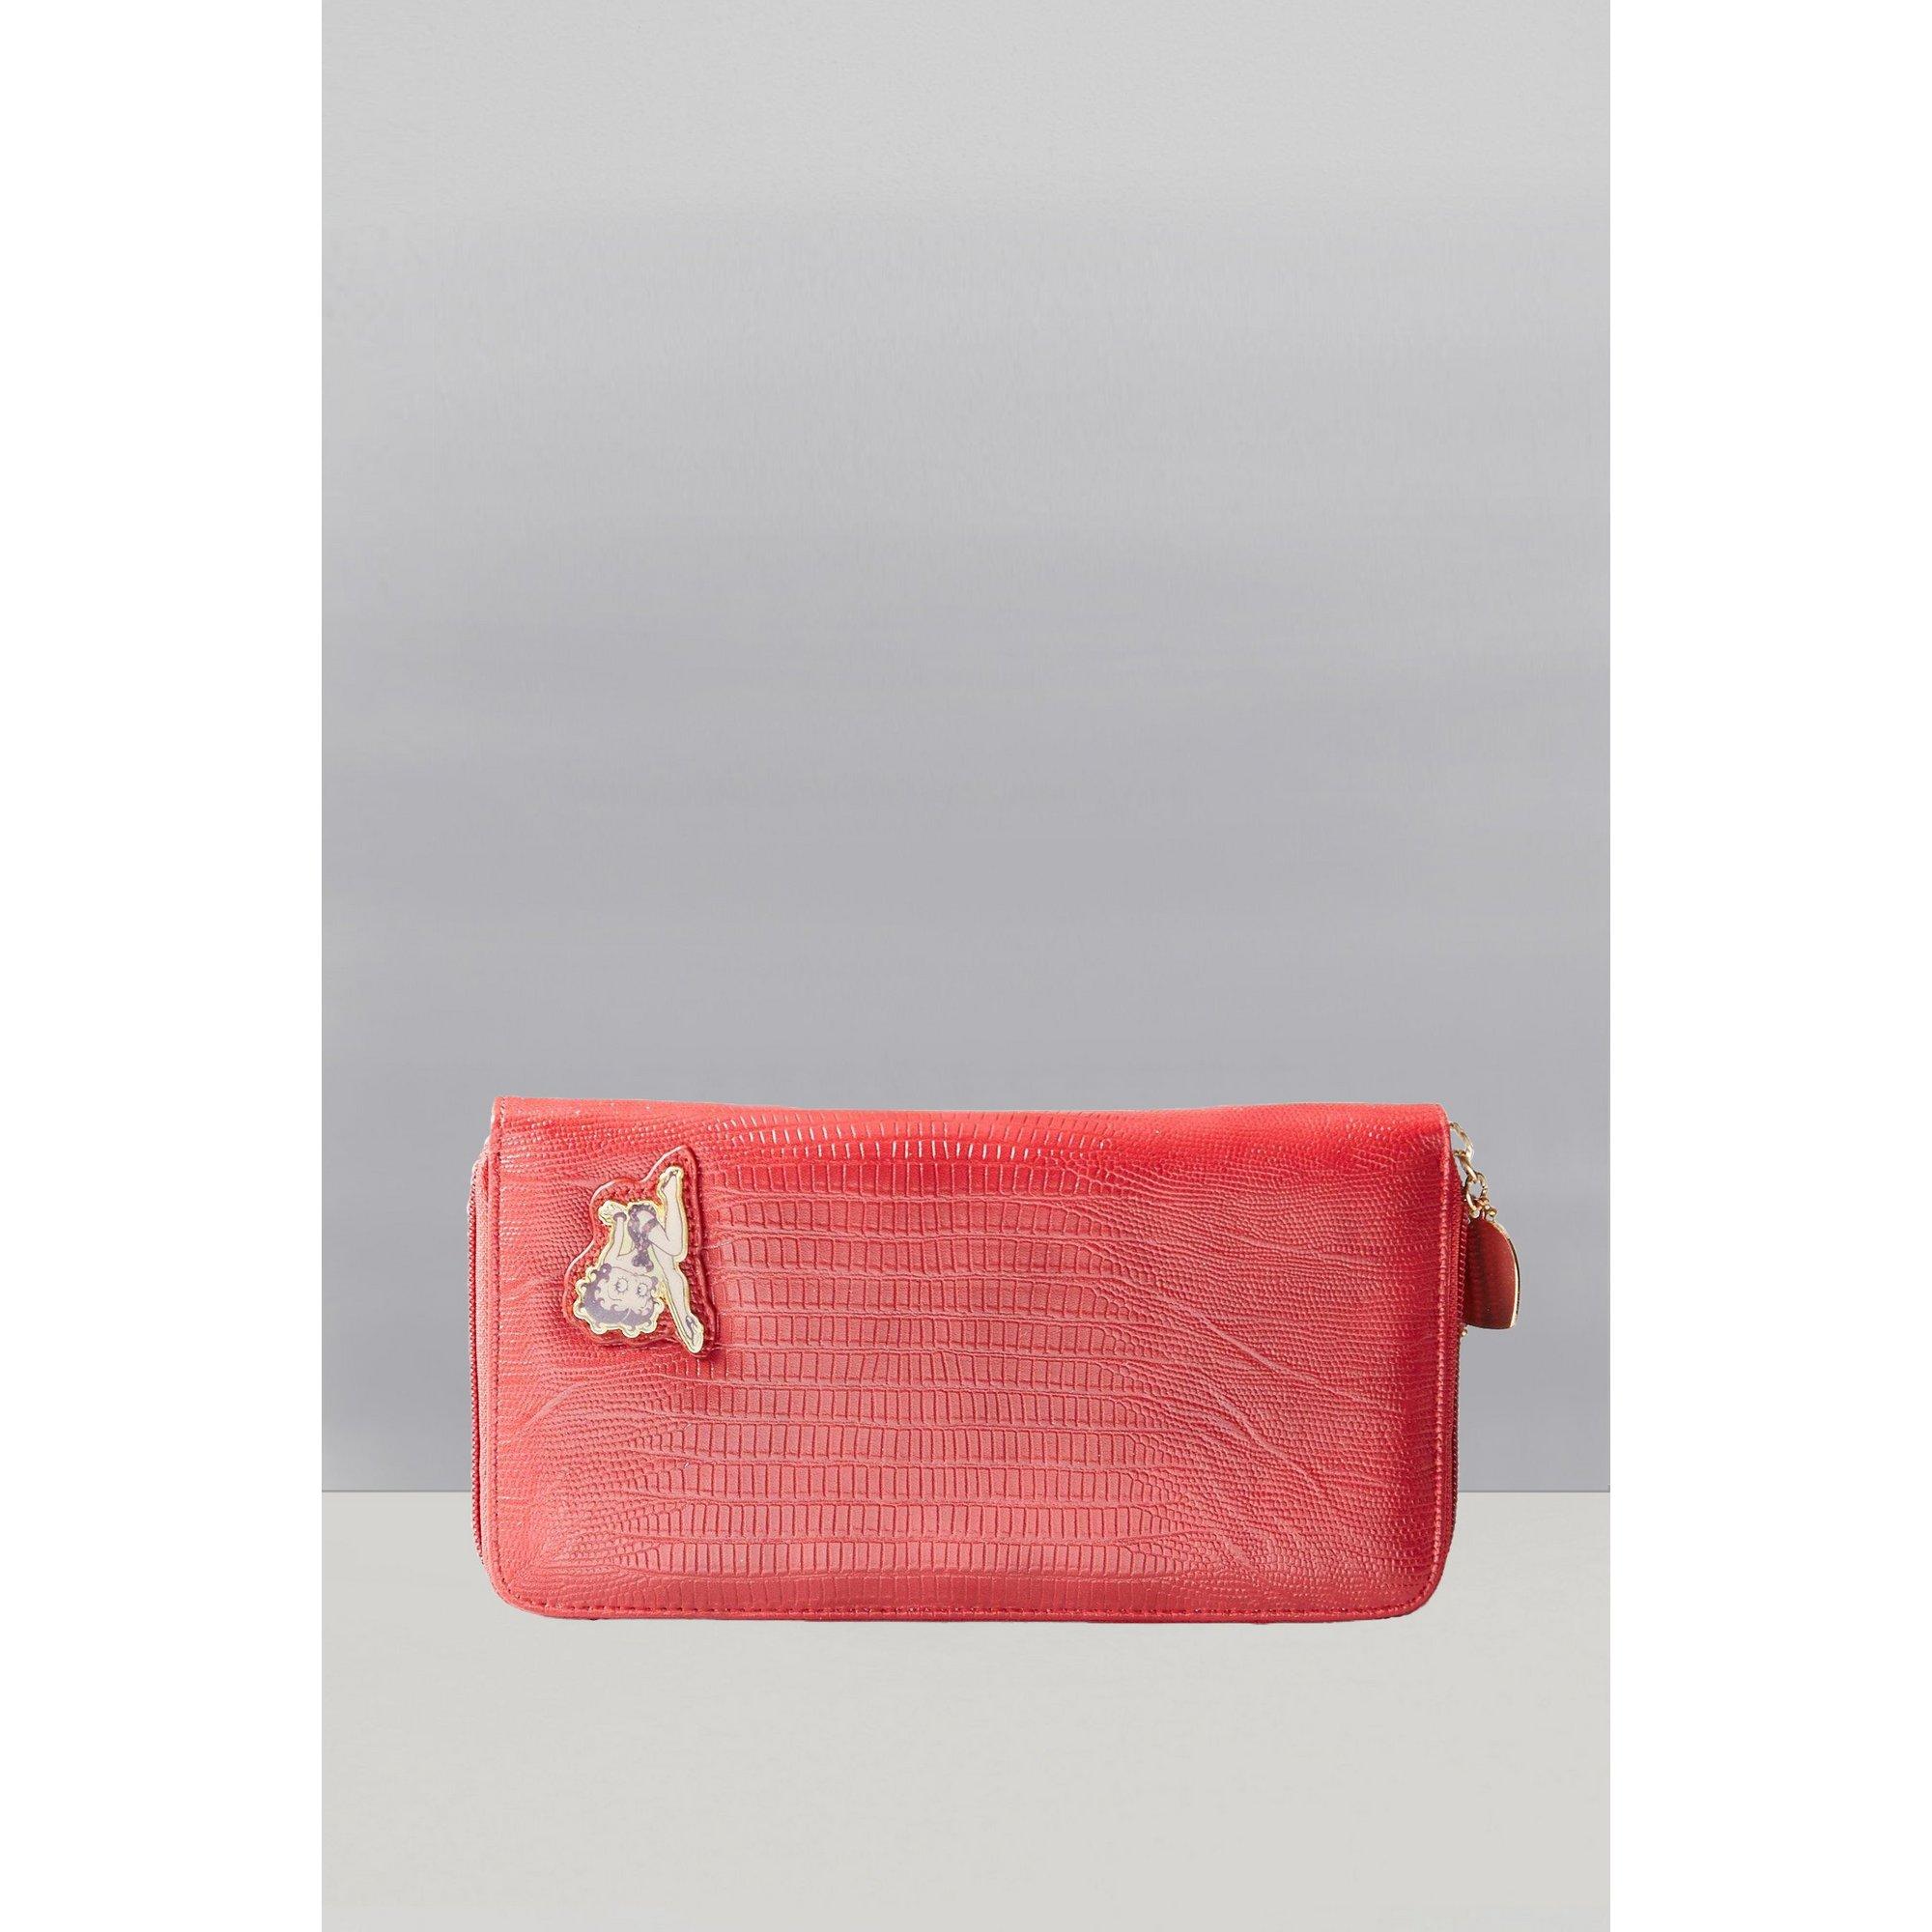 Image of Betty Boop Classic Zip Around Purse